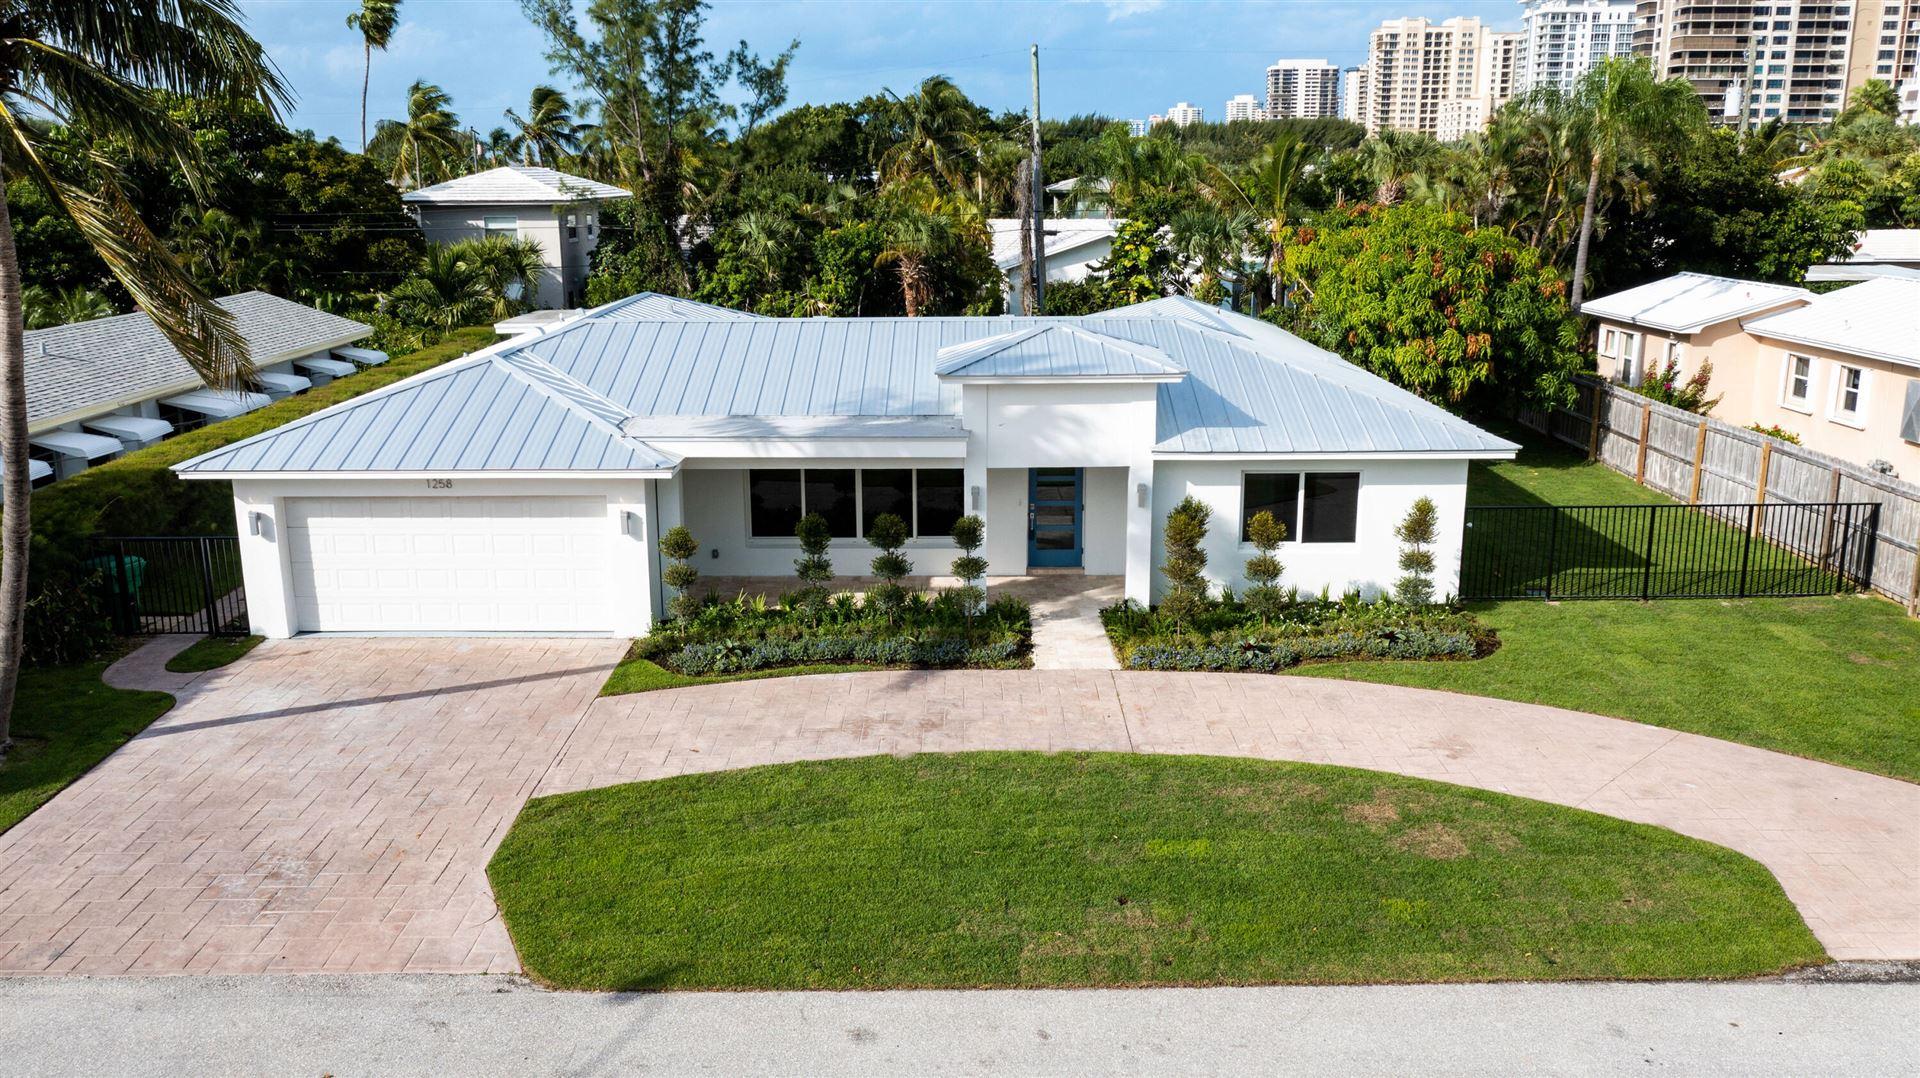 Photo of 1258 Yacht Harbor Drive, Riviera Beach, FL 33404 (MLS # RX-10746711)